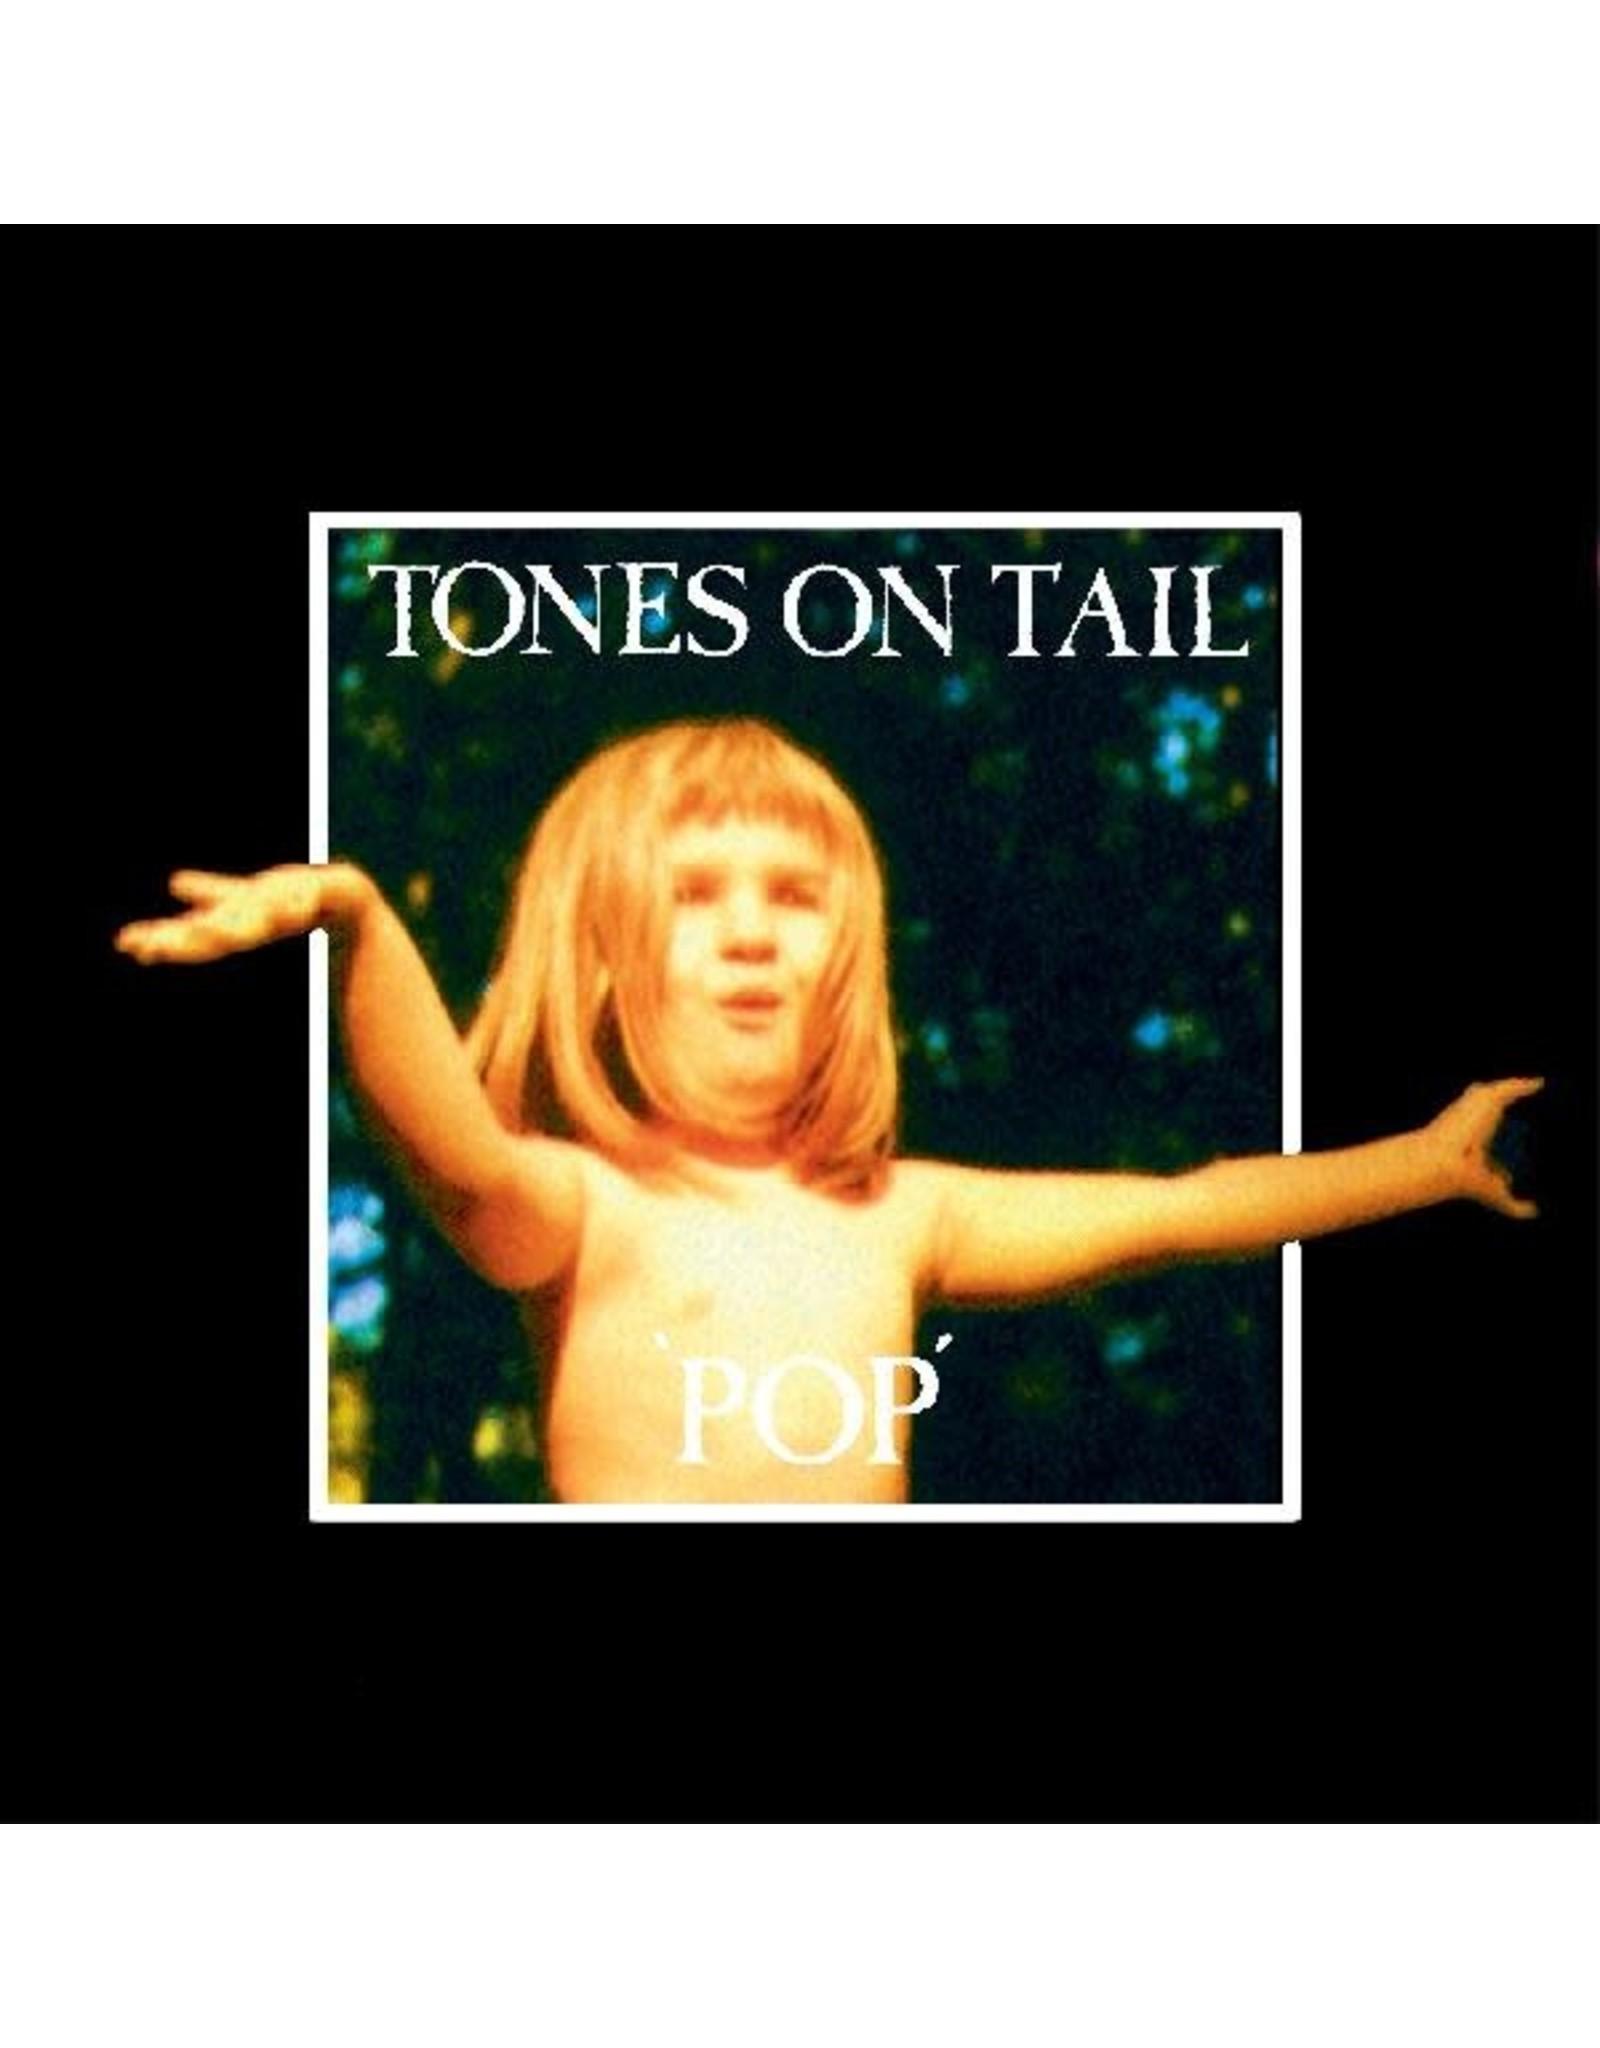 New Vinyl Tones On Tail - Pop 2LP